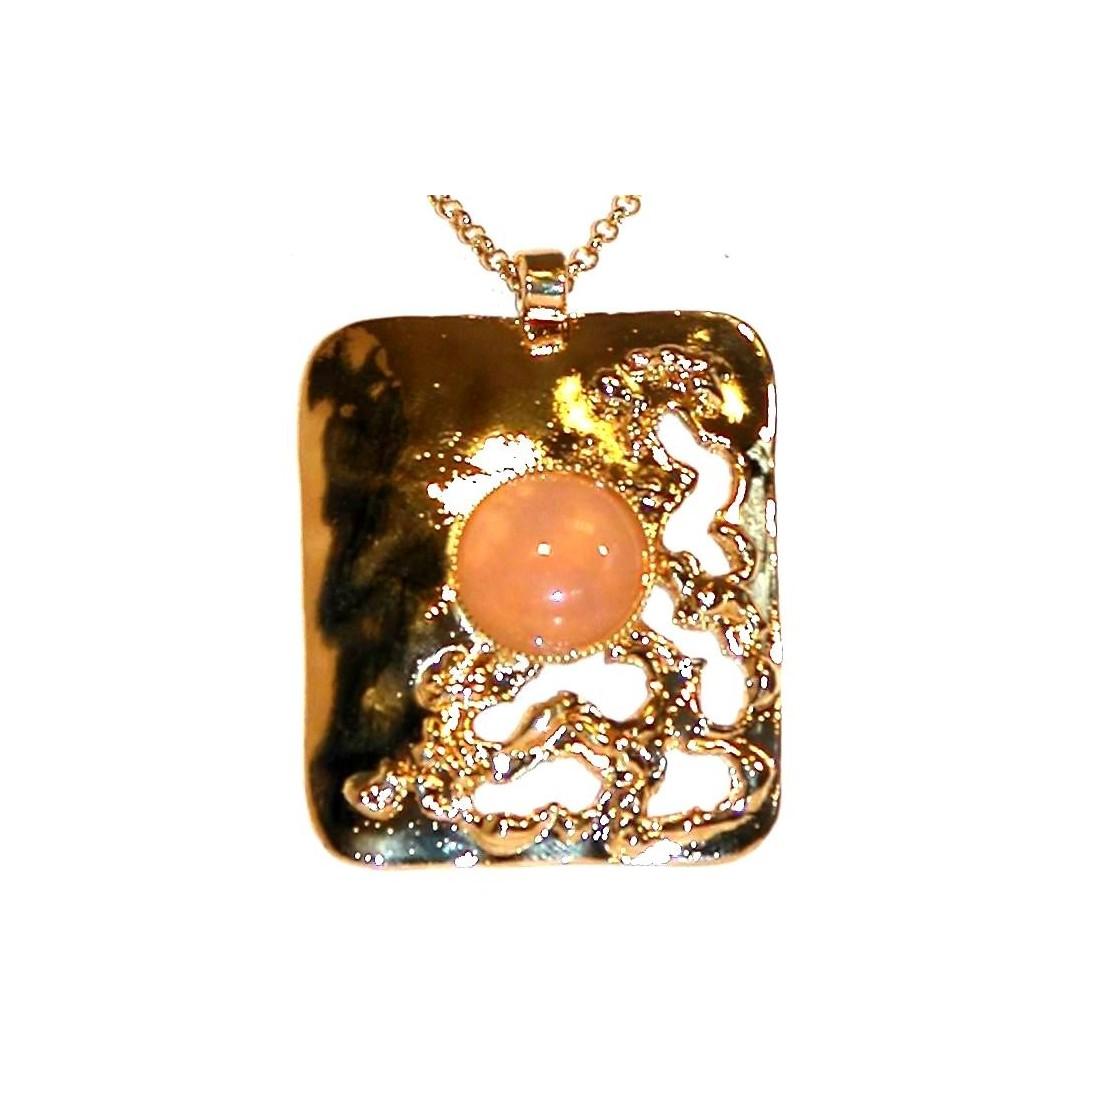 Pendentif  avec une pierre semi-précieuse quartz rose